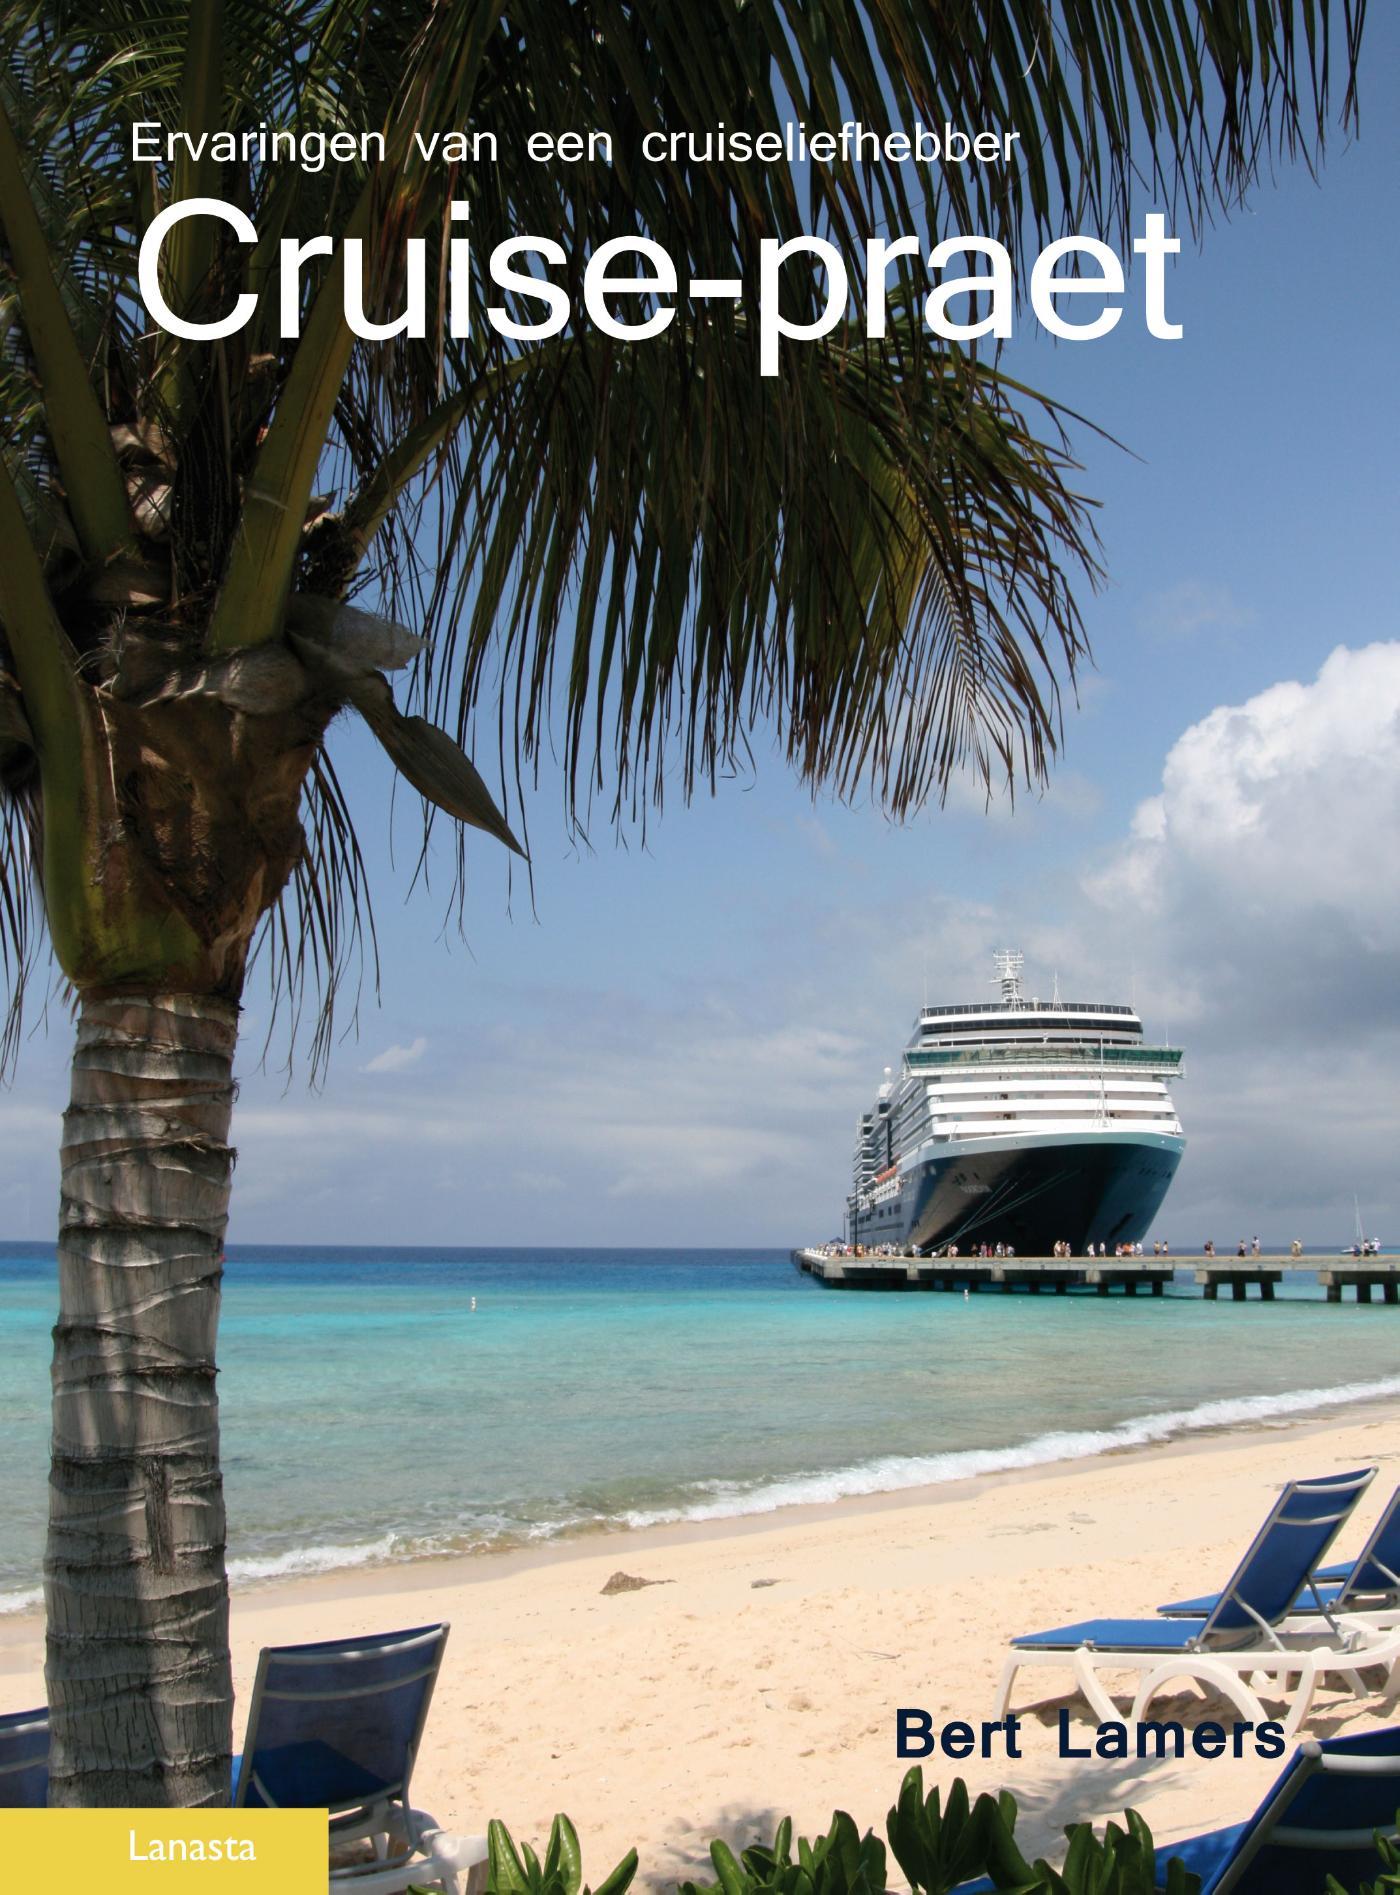 Cruise-praet